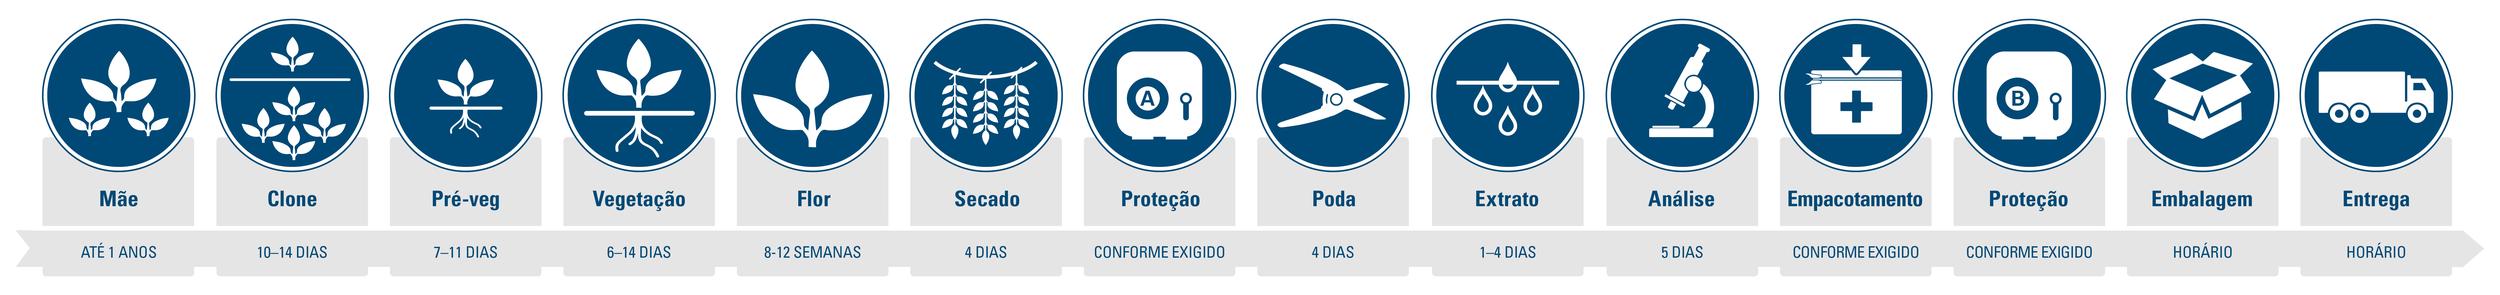 Tilray_Process-Diagram_Portugese_V1.png